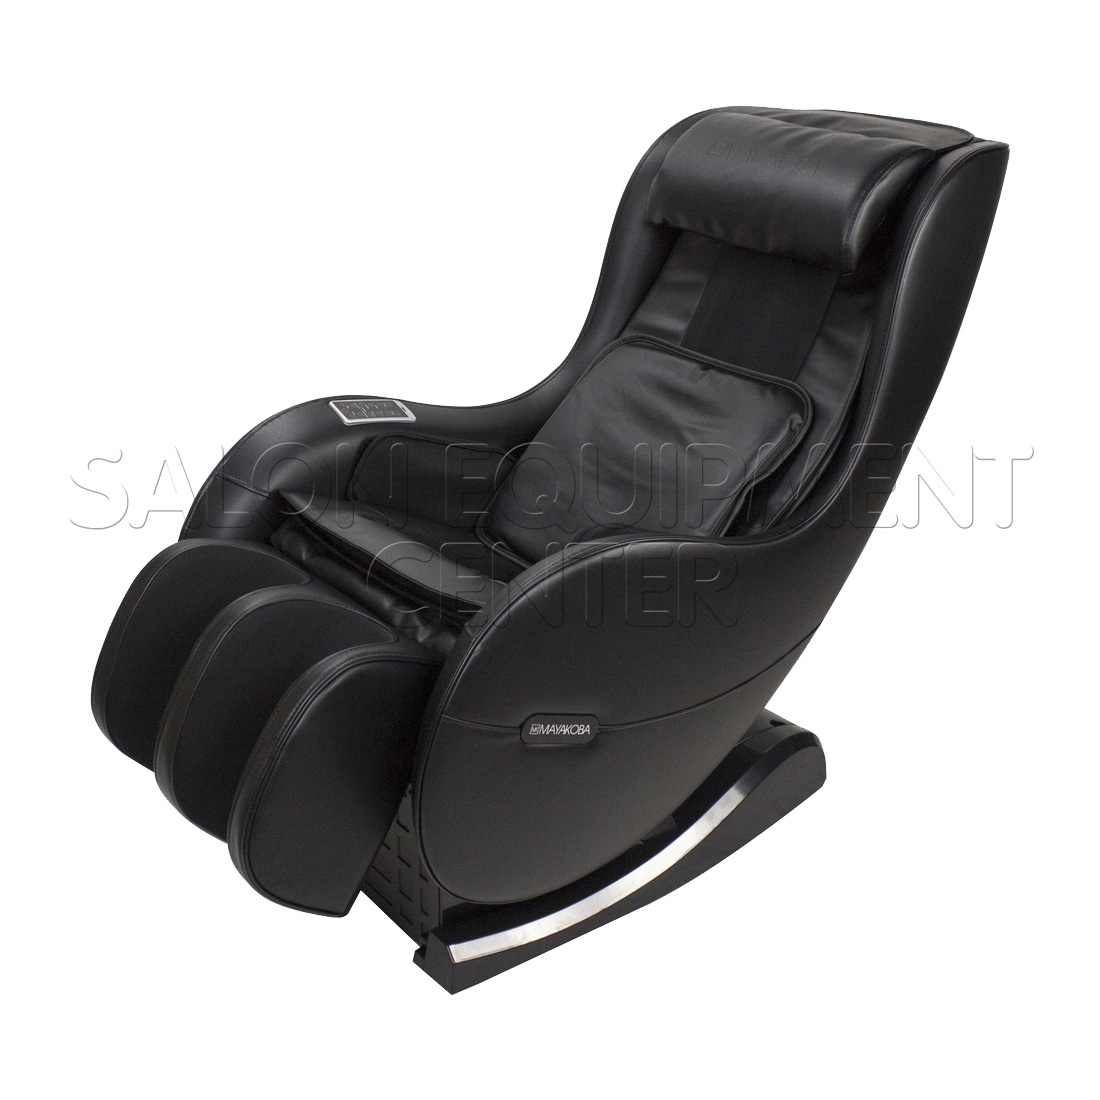 Futura Massage Chair Black Salon Equipment Center